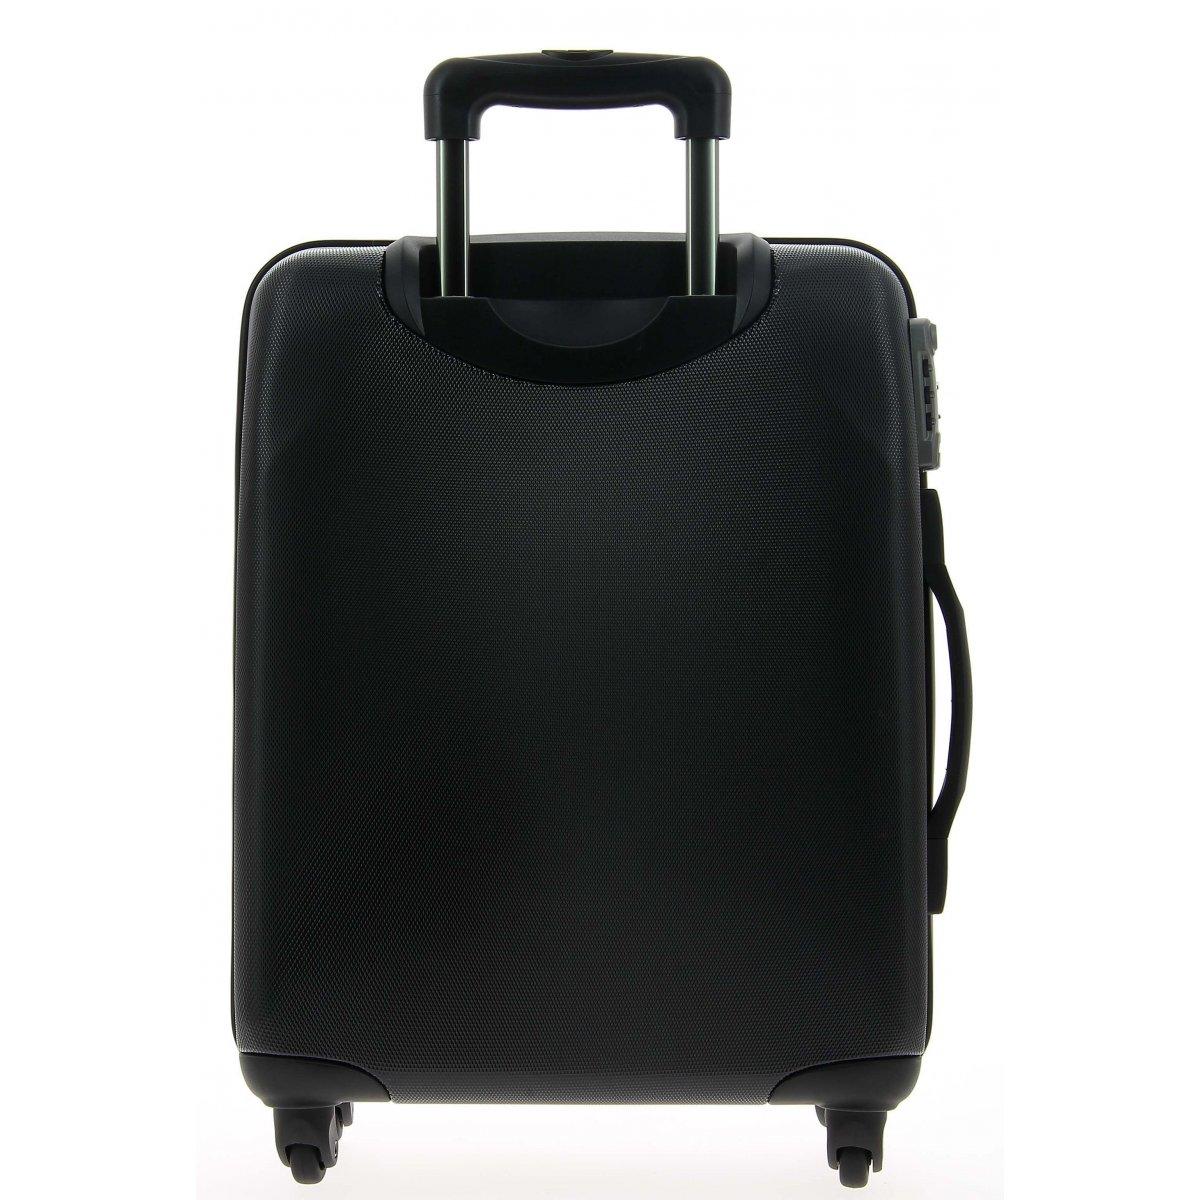 valise cabine delsey shedule 802 schedule802 couleur principale noir promotion. Black Bedroom Furniture Sets. Home Design Ideas